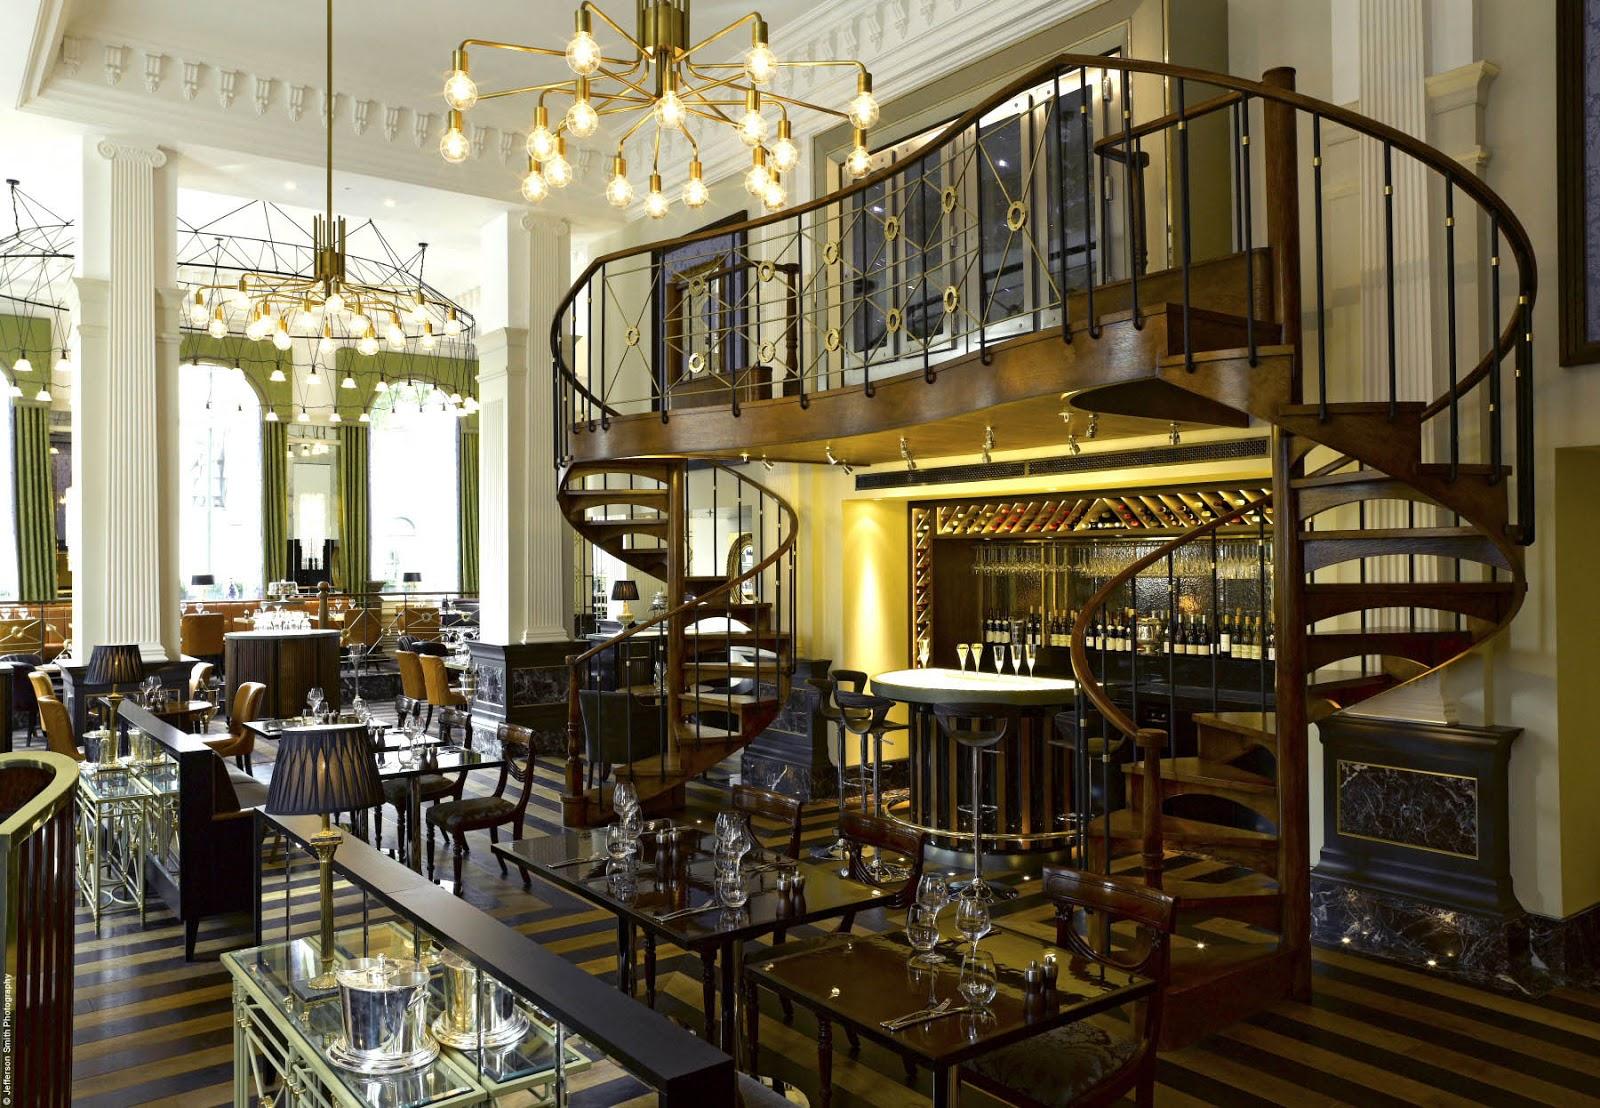 The Balcon Luxury Brunch Adventures of a London Kiwi